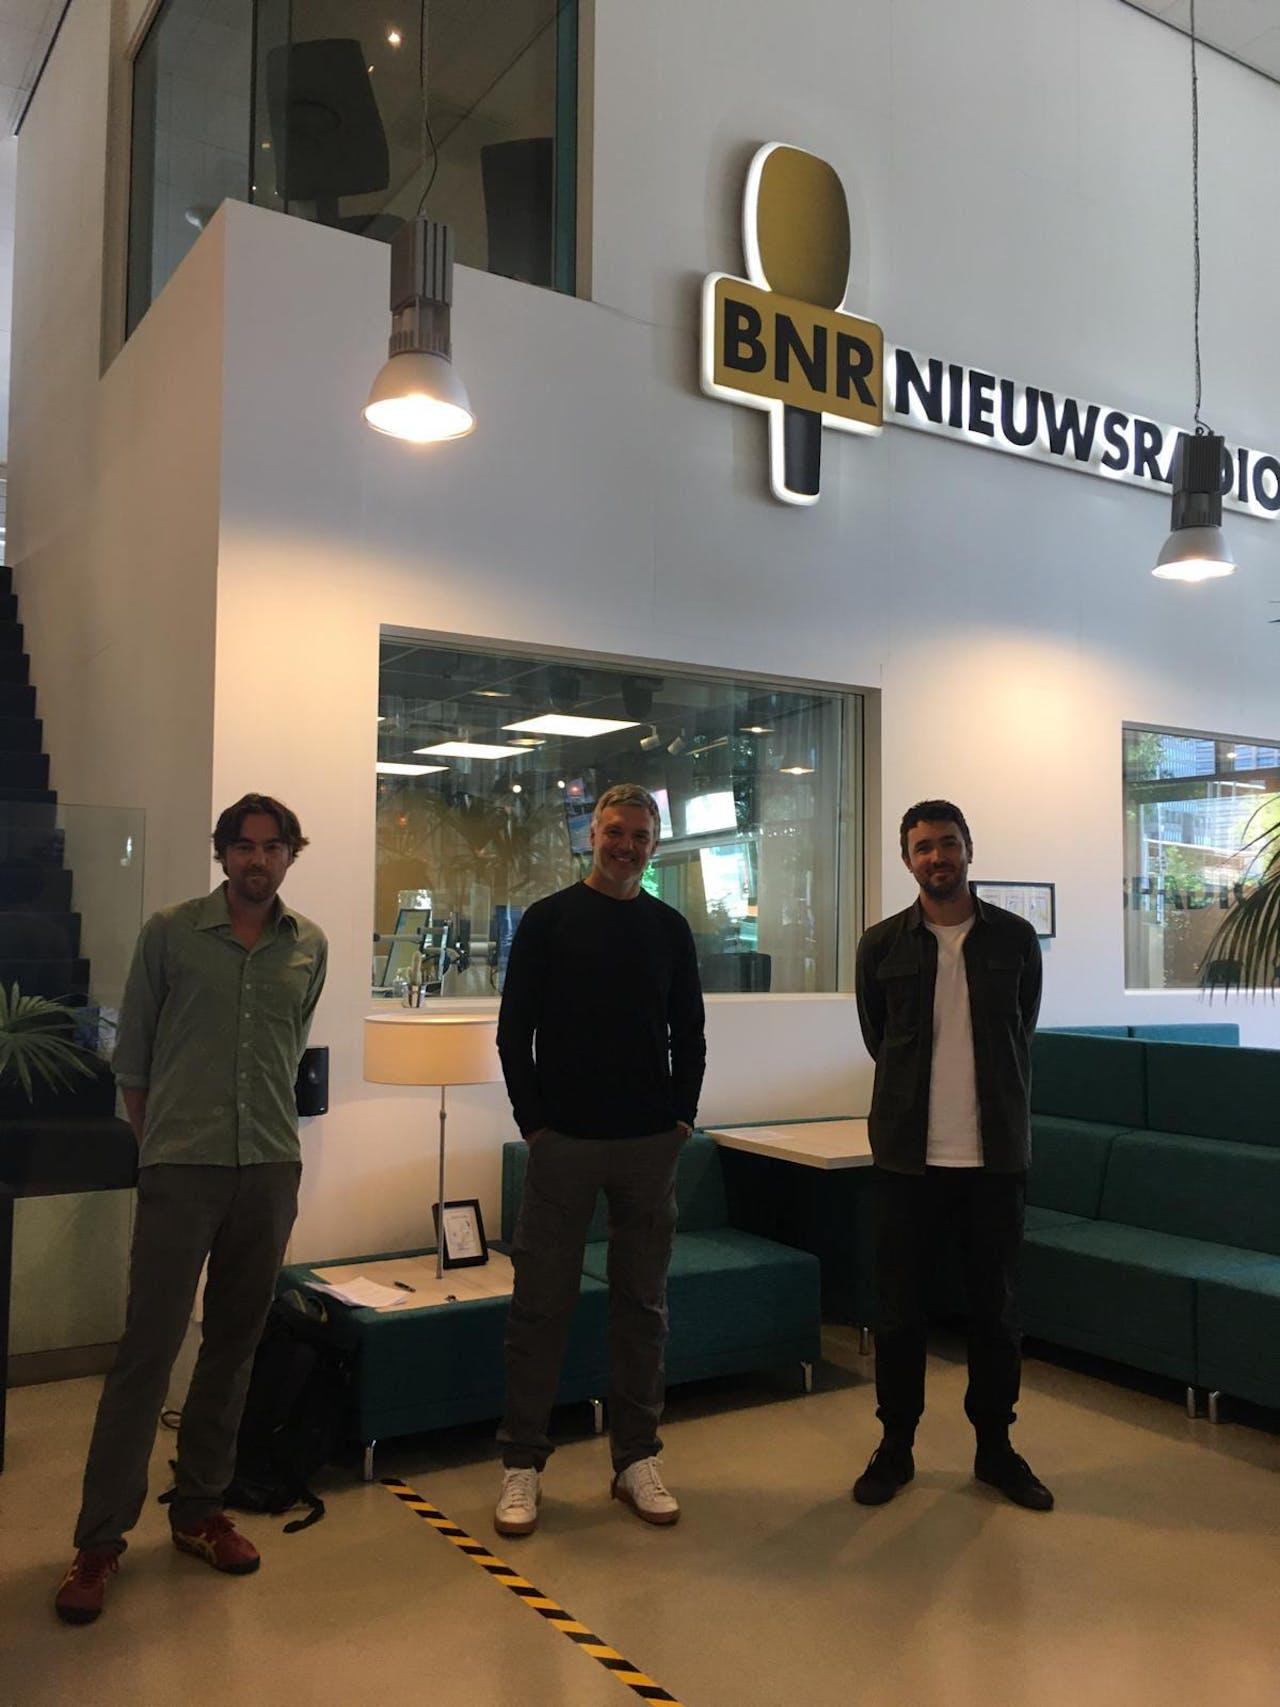 V.l.n.r.: Marc Nolden, Paul Laseur en Tim Verlaan.